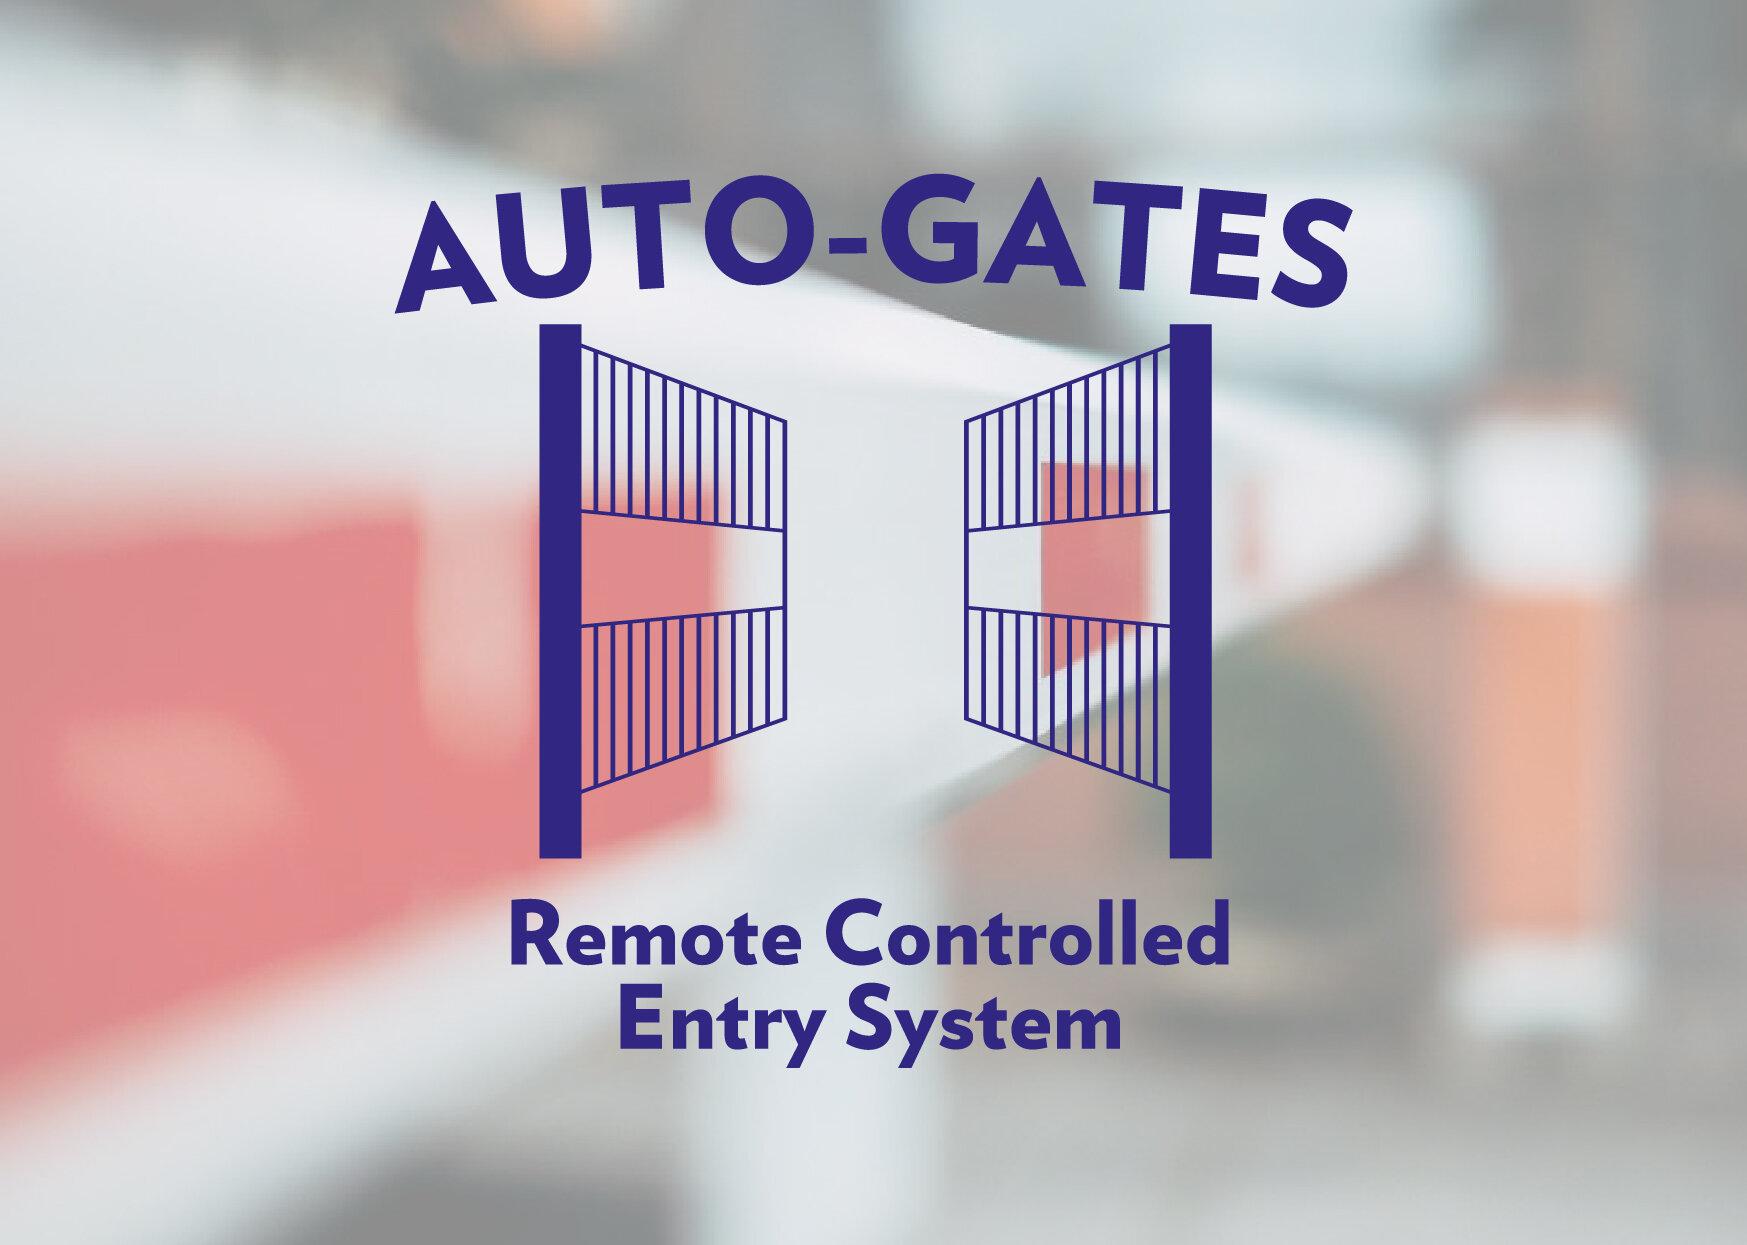 autogatesscotland.co.uk